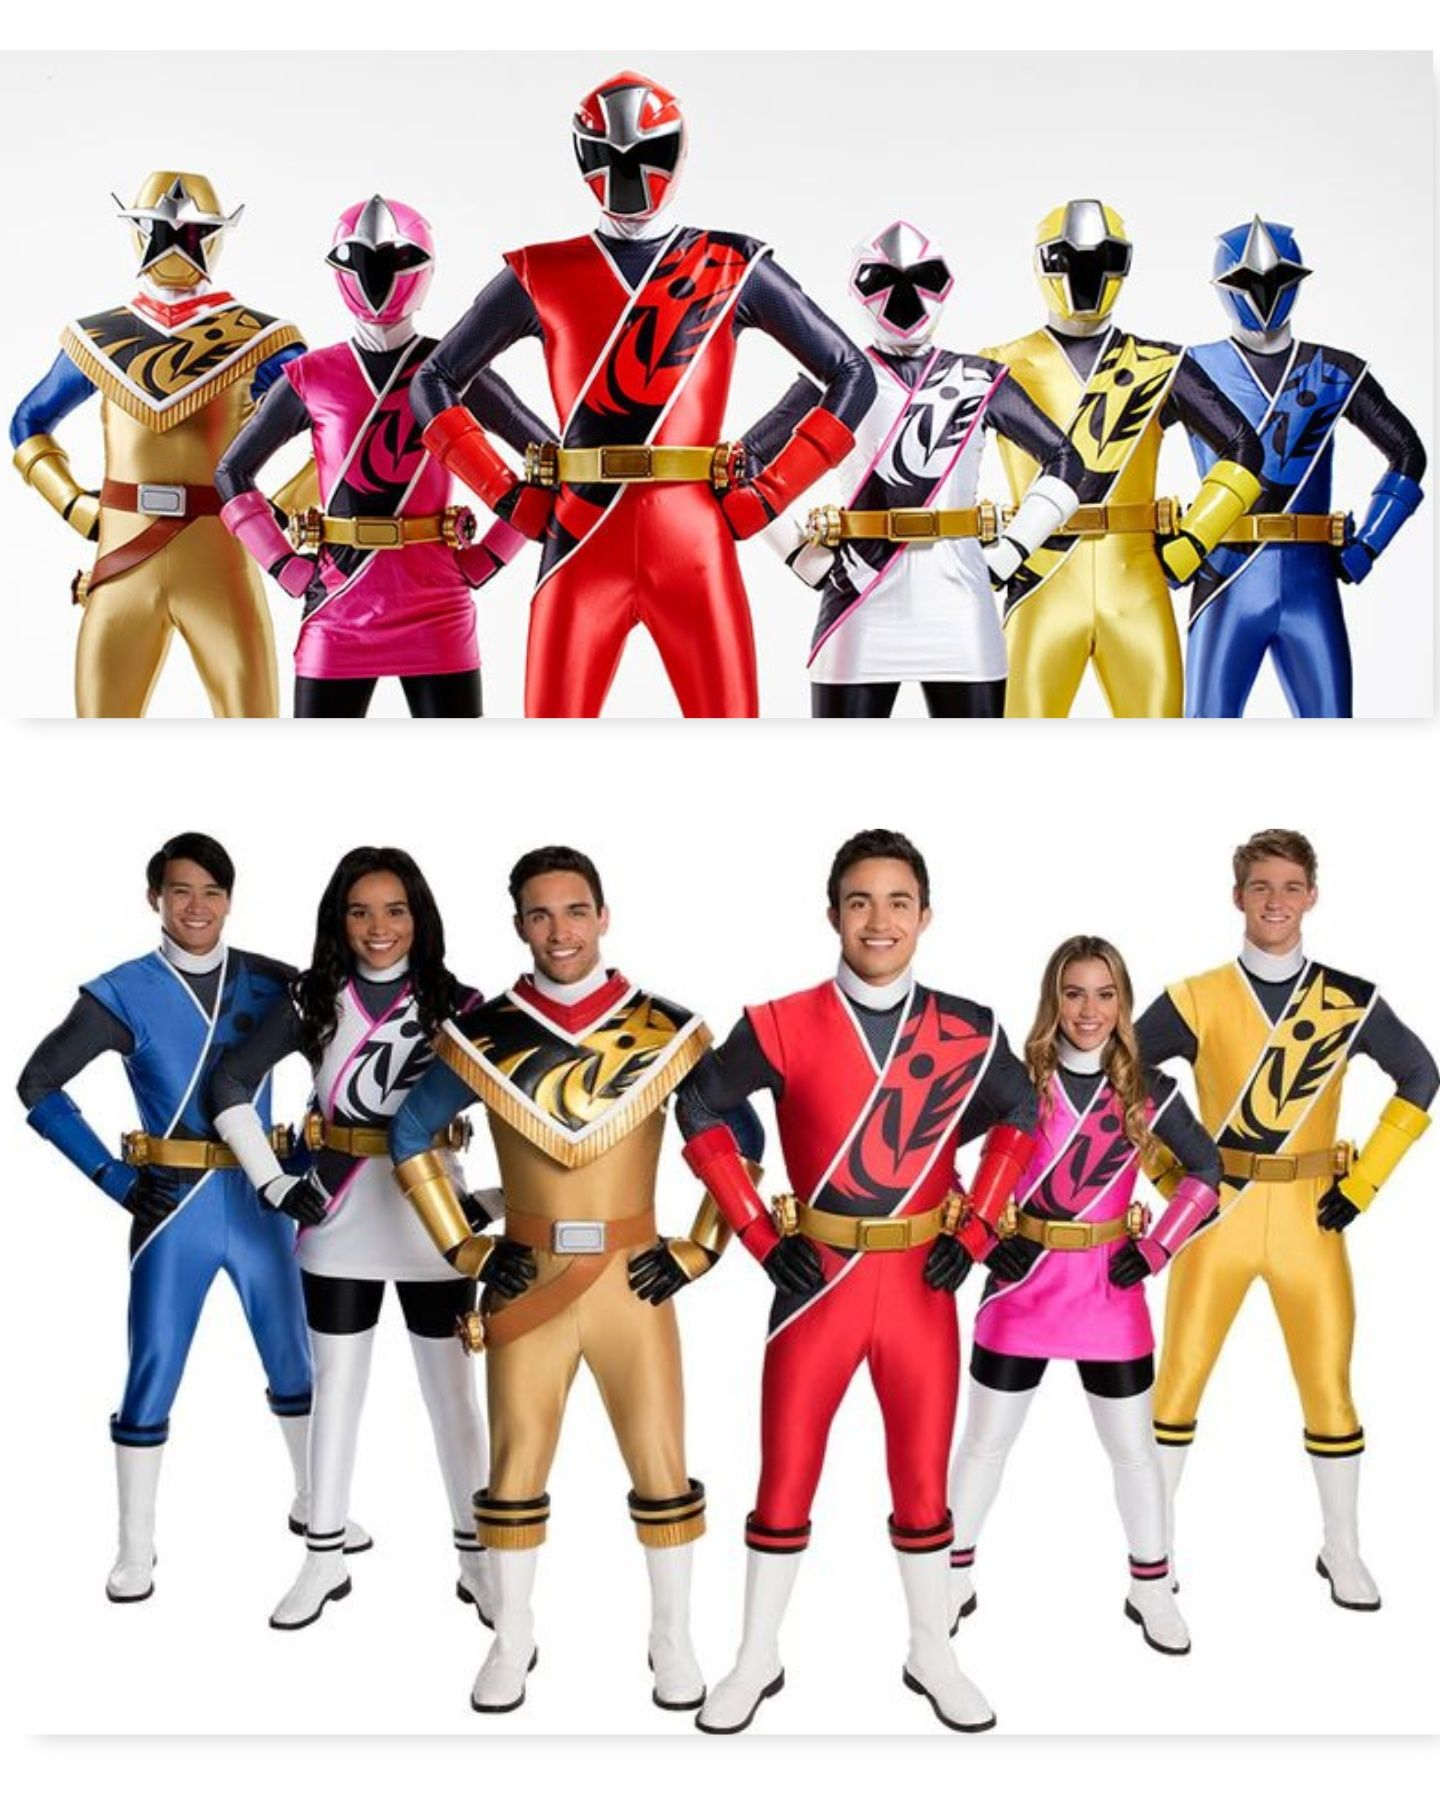 Power Rangers T26 Super Ninja Steel 2018 Power Rangers Super Samurai Power Rangers Ninja Power Rangers Ninja Steel